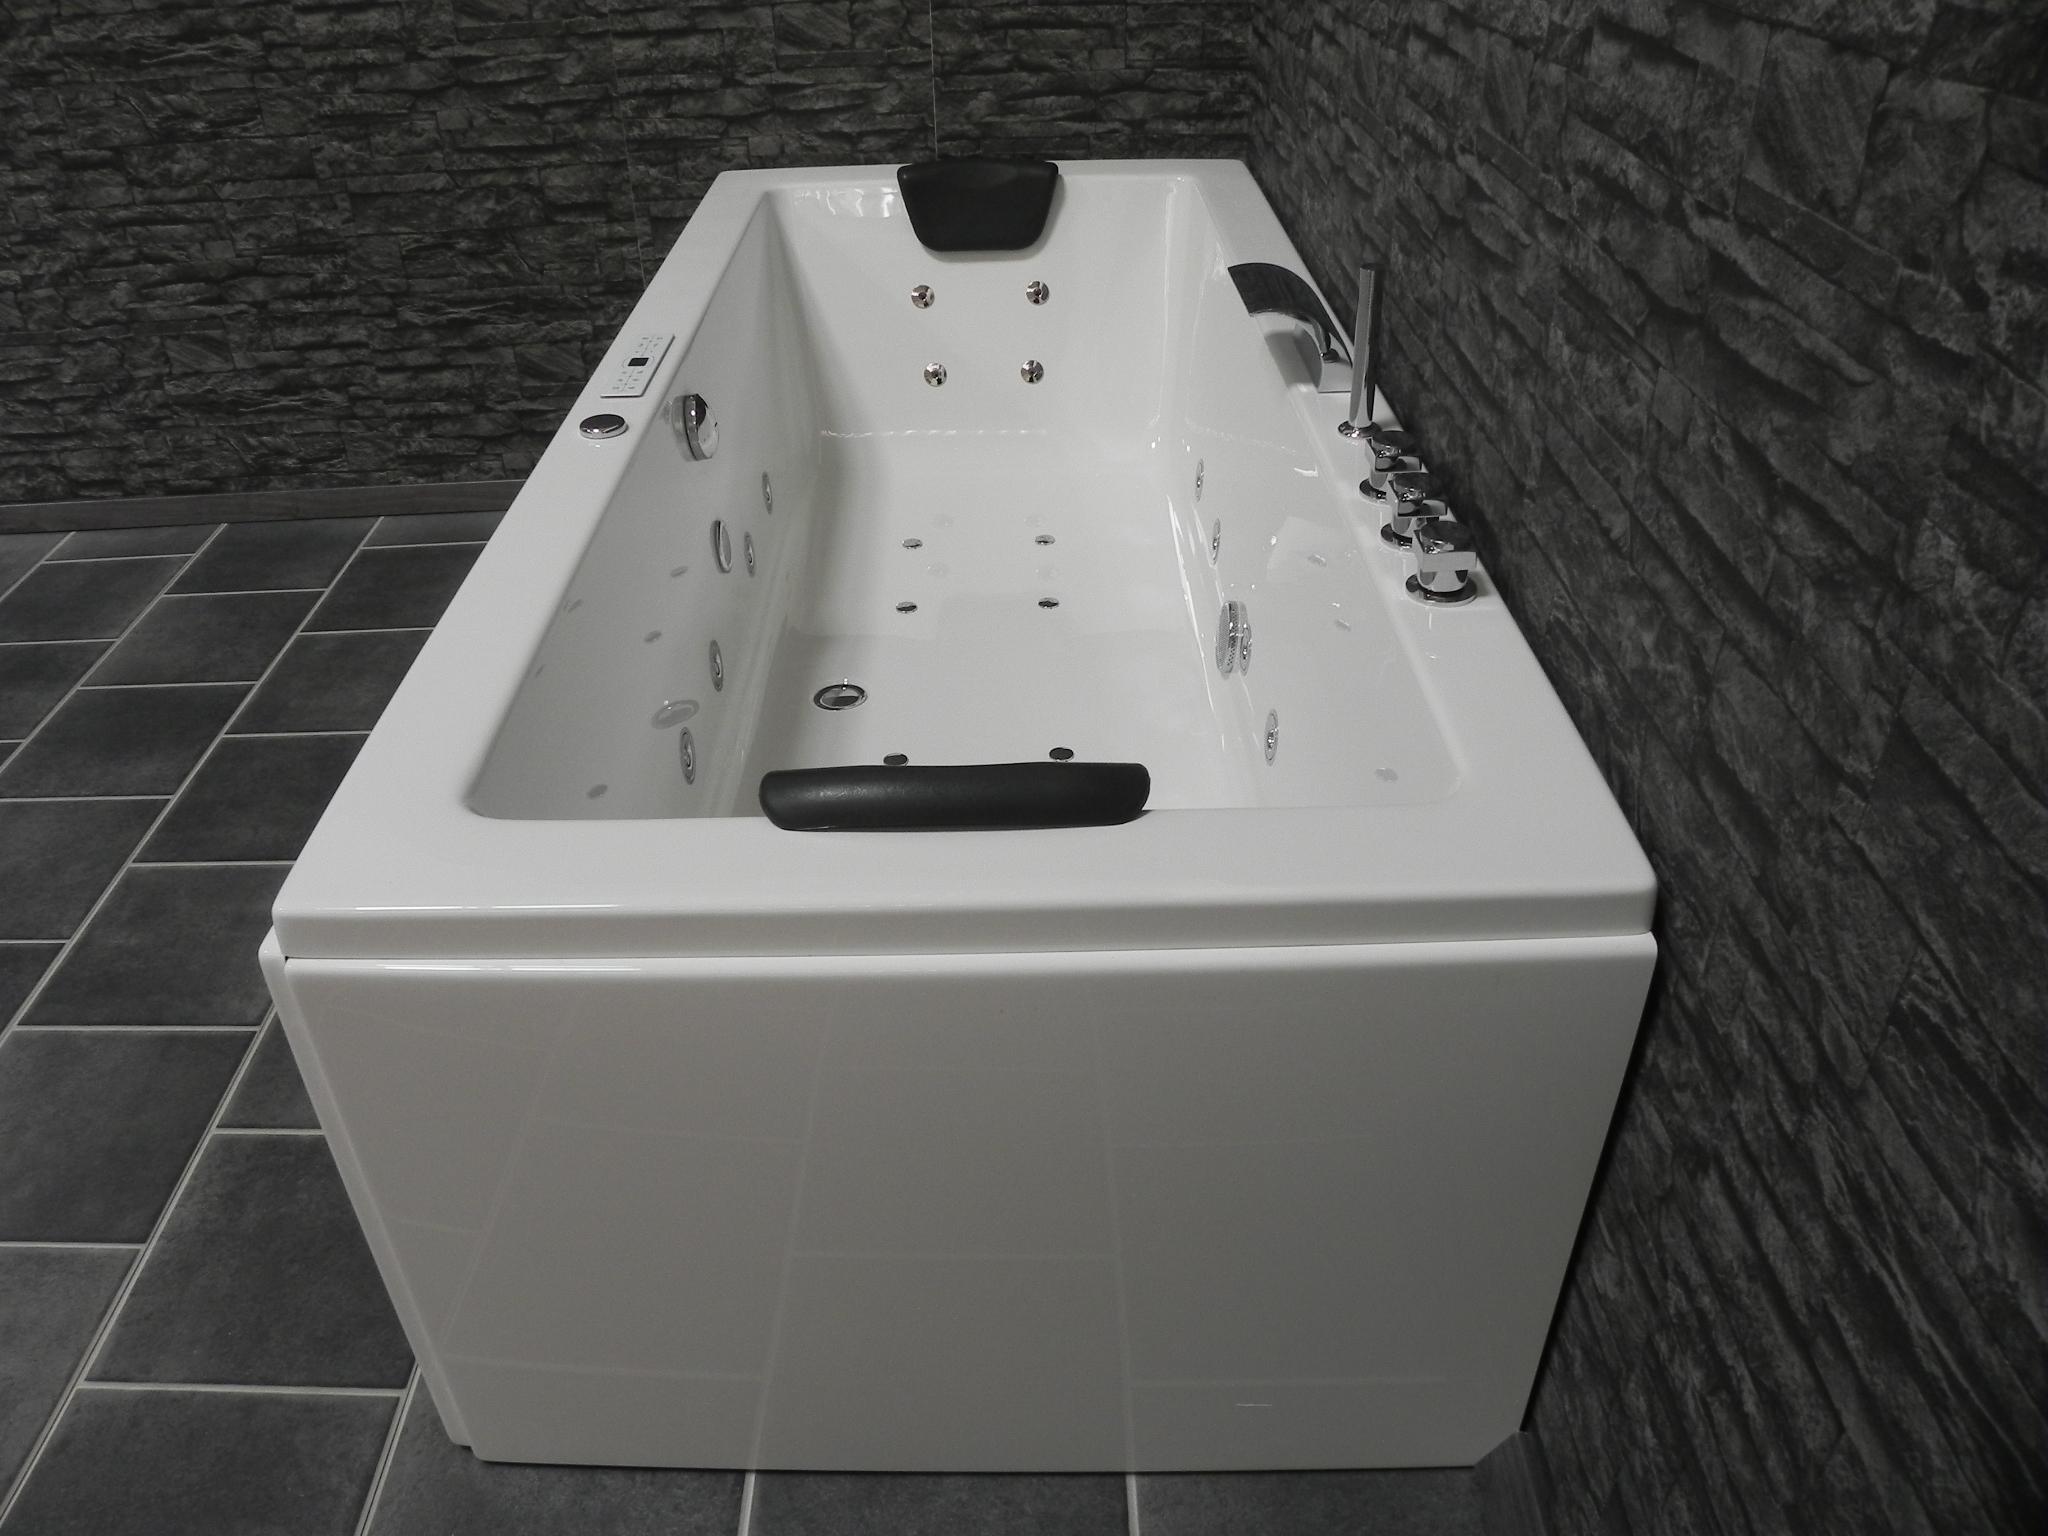 baignoire 200x90. Black Bedroom Furniture Sets. Home Design Ideas